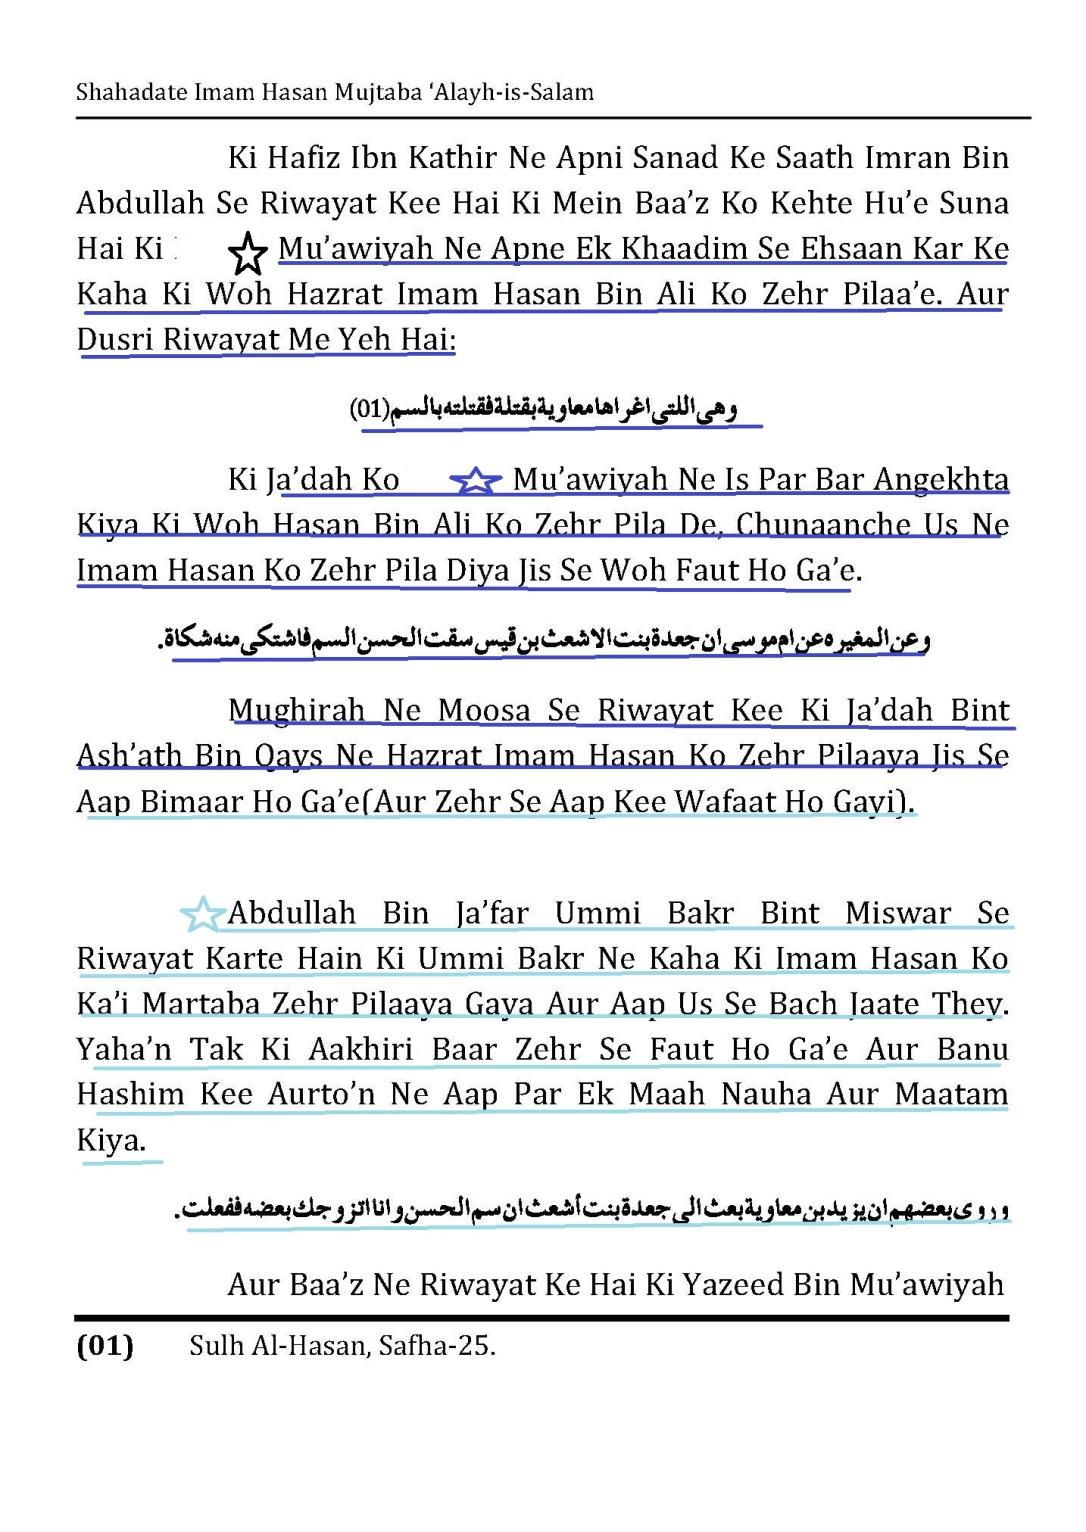 shahadate-imam-hasan-mujtaba-e28098alayh-is-salam-pdf_unlocked_Page_08